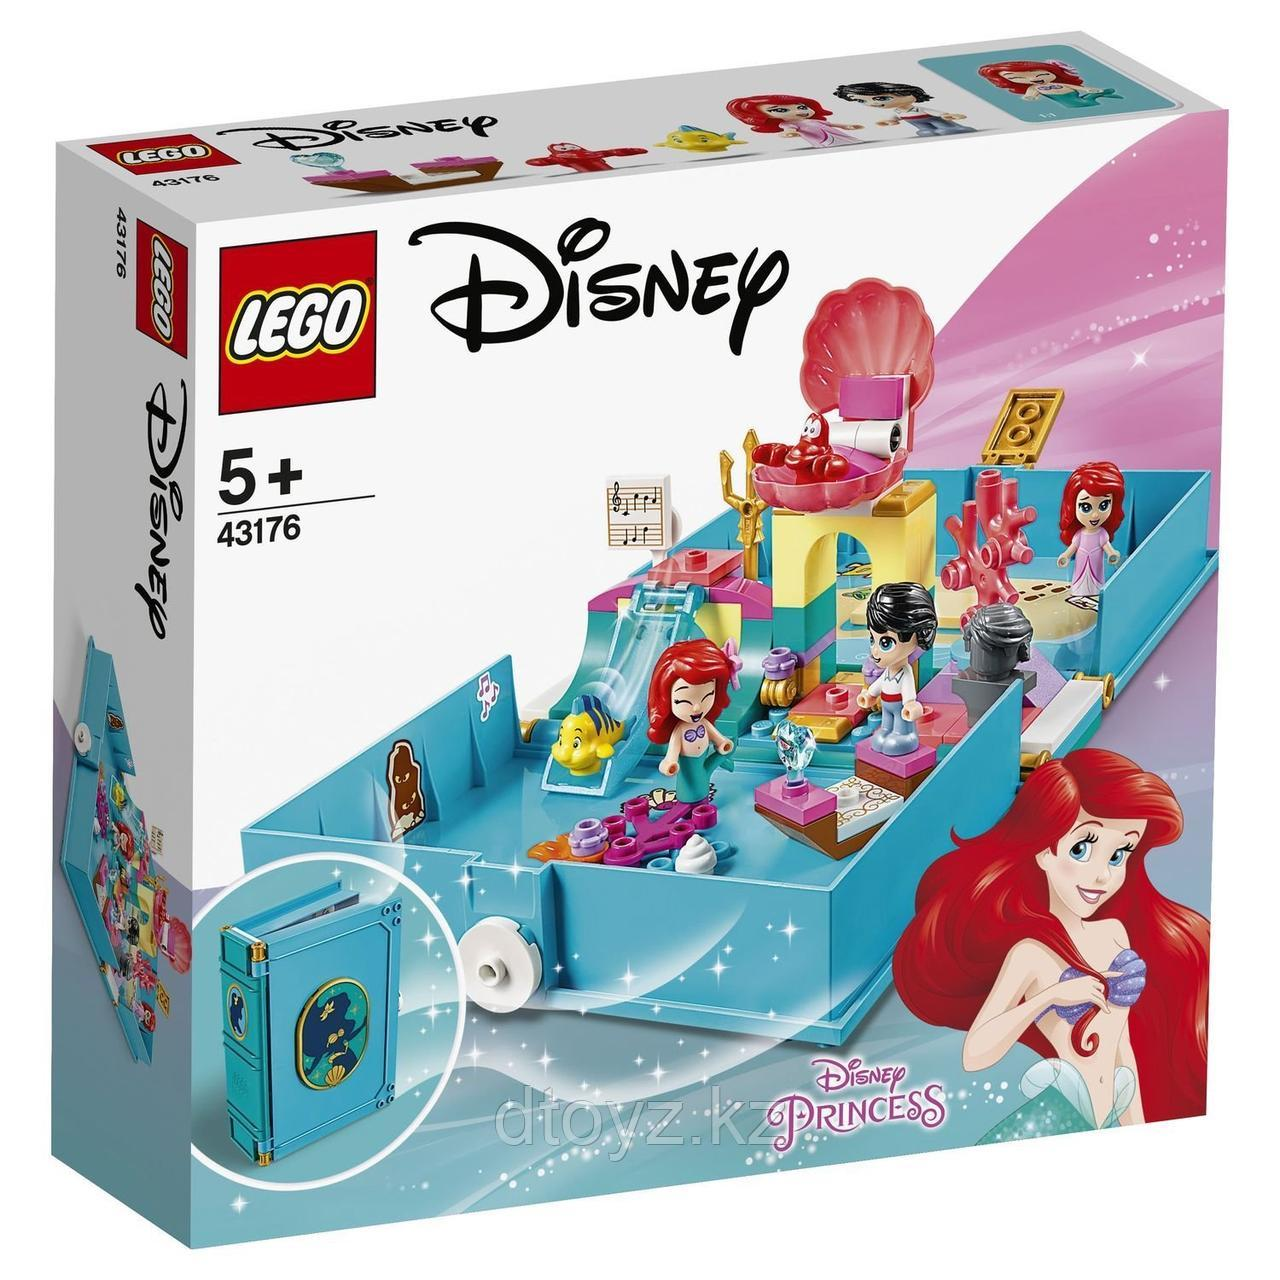 Lego Disney Princess 43176 Книга приключений Ариэль